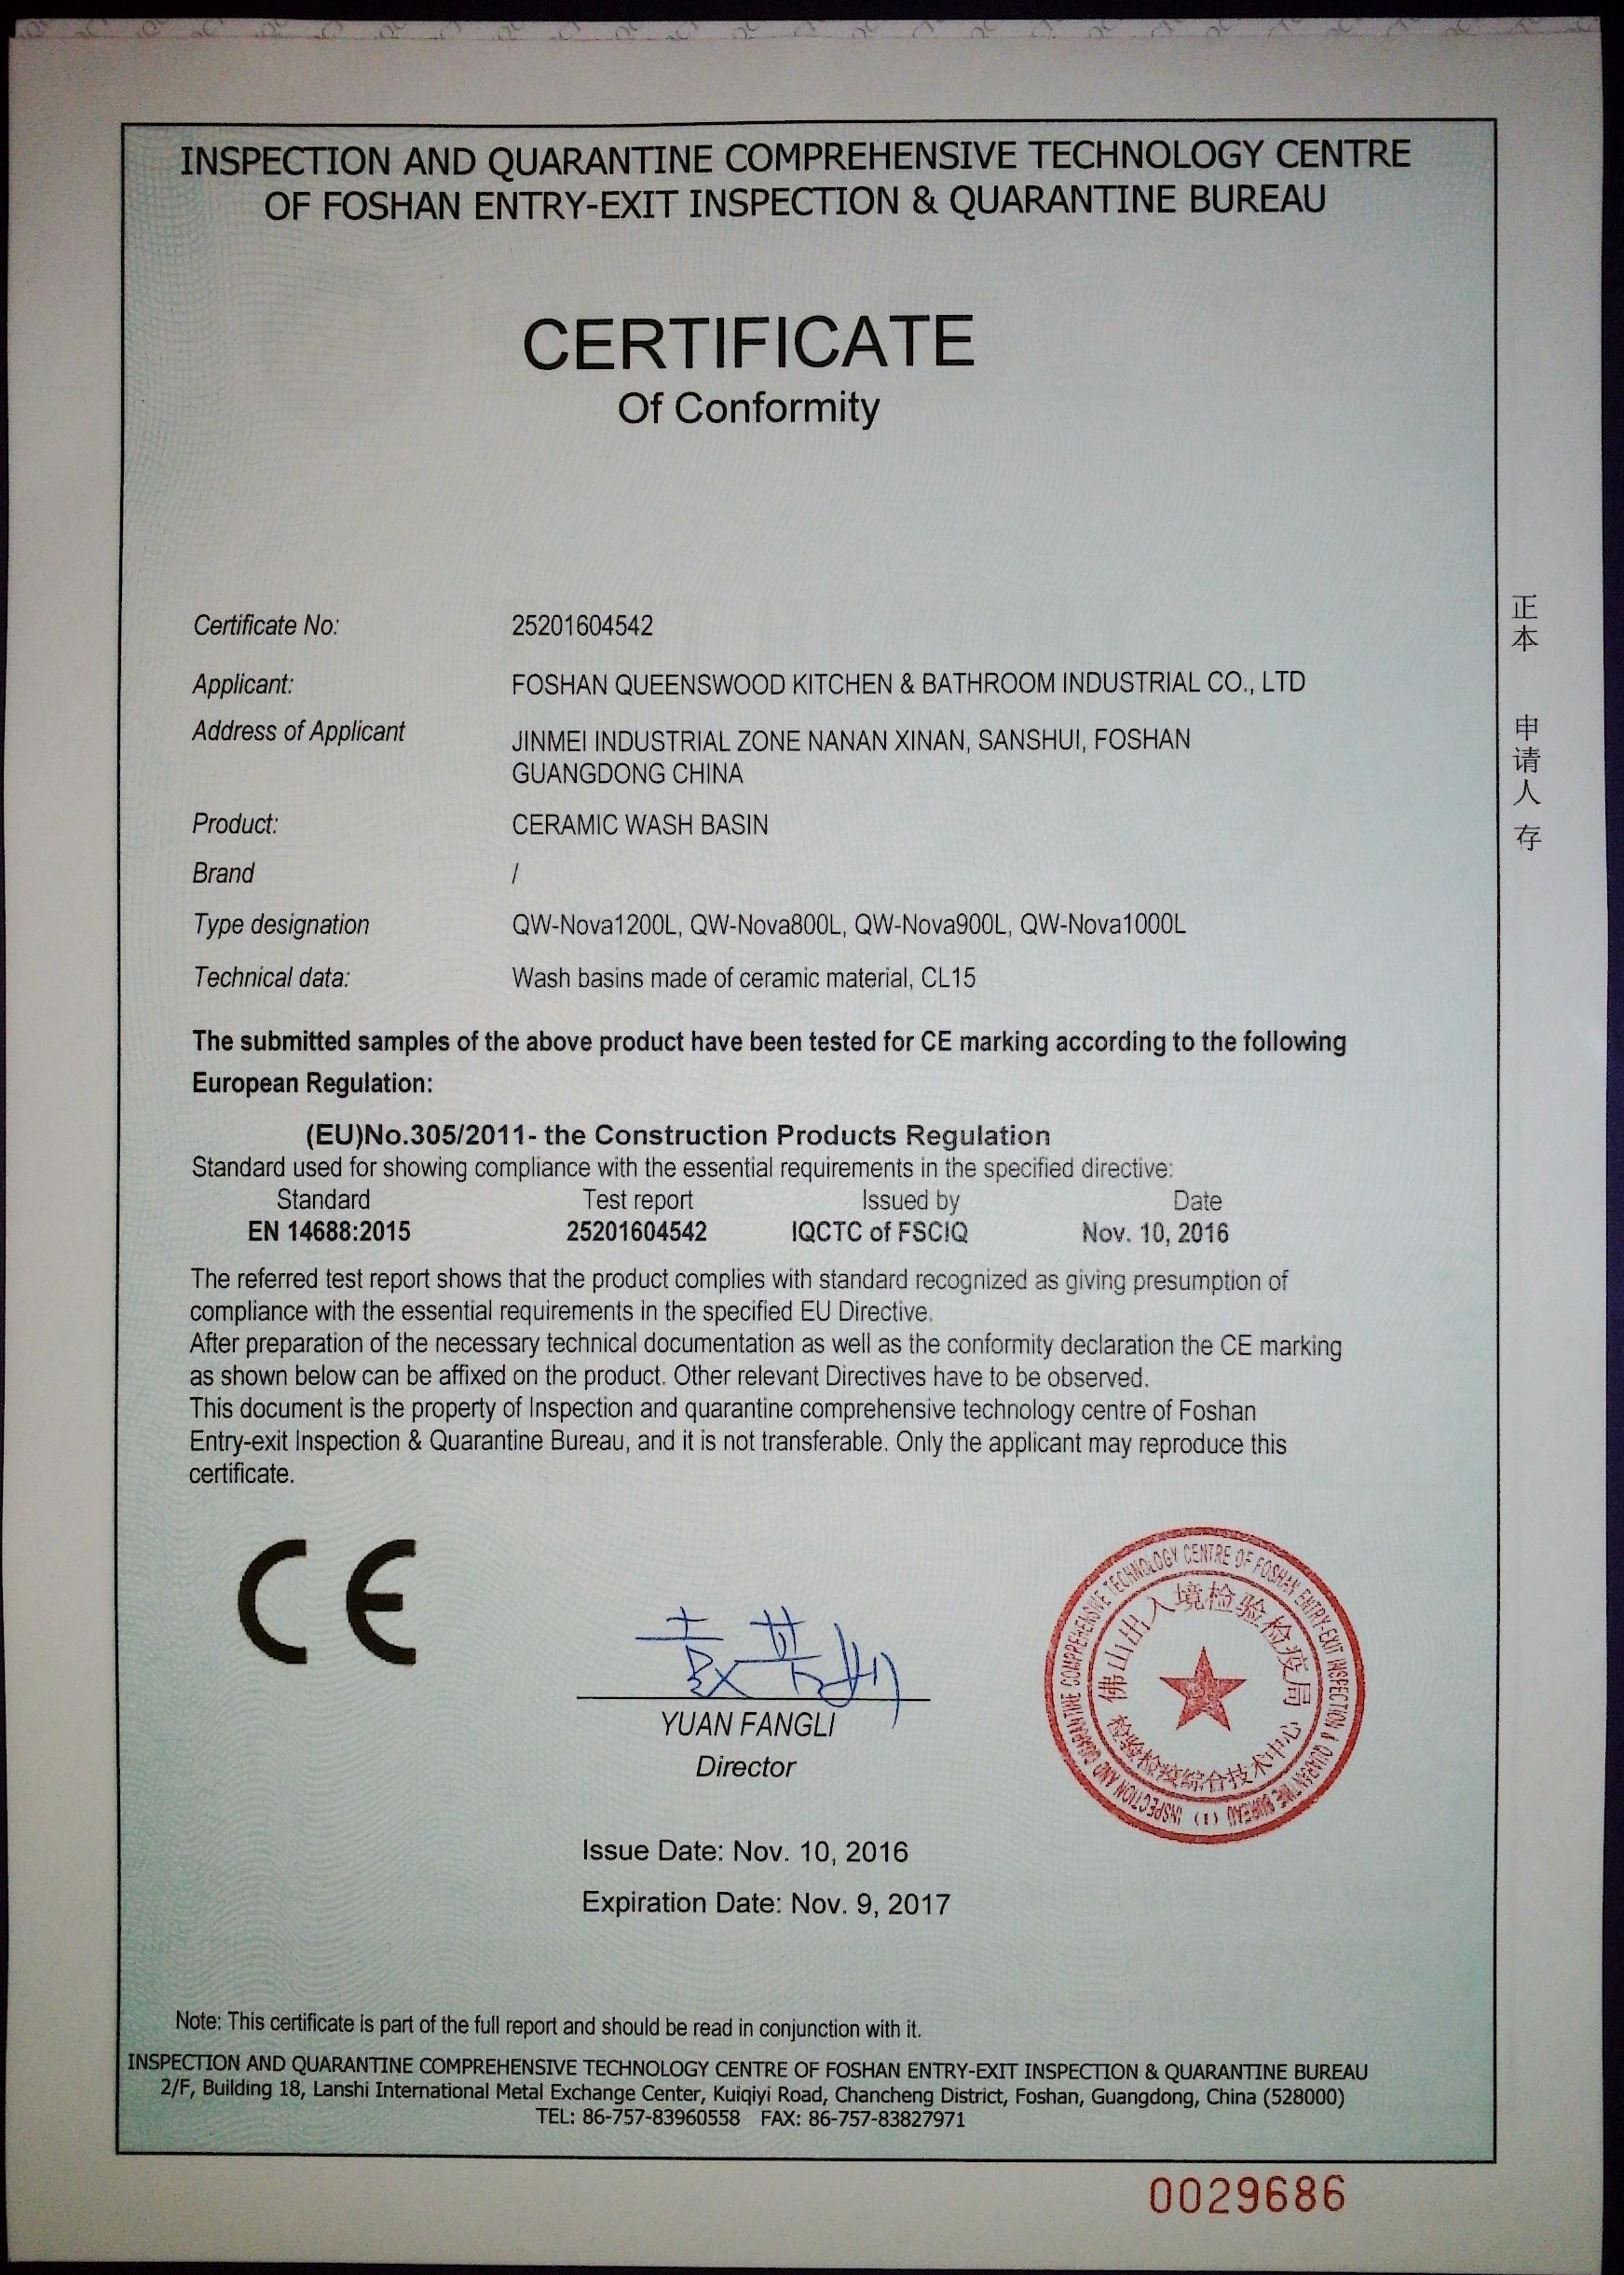 Basin Certificate of Conformity